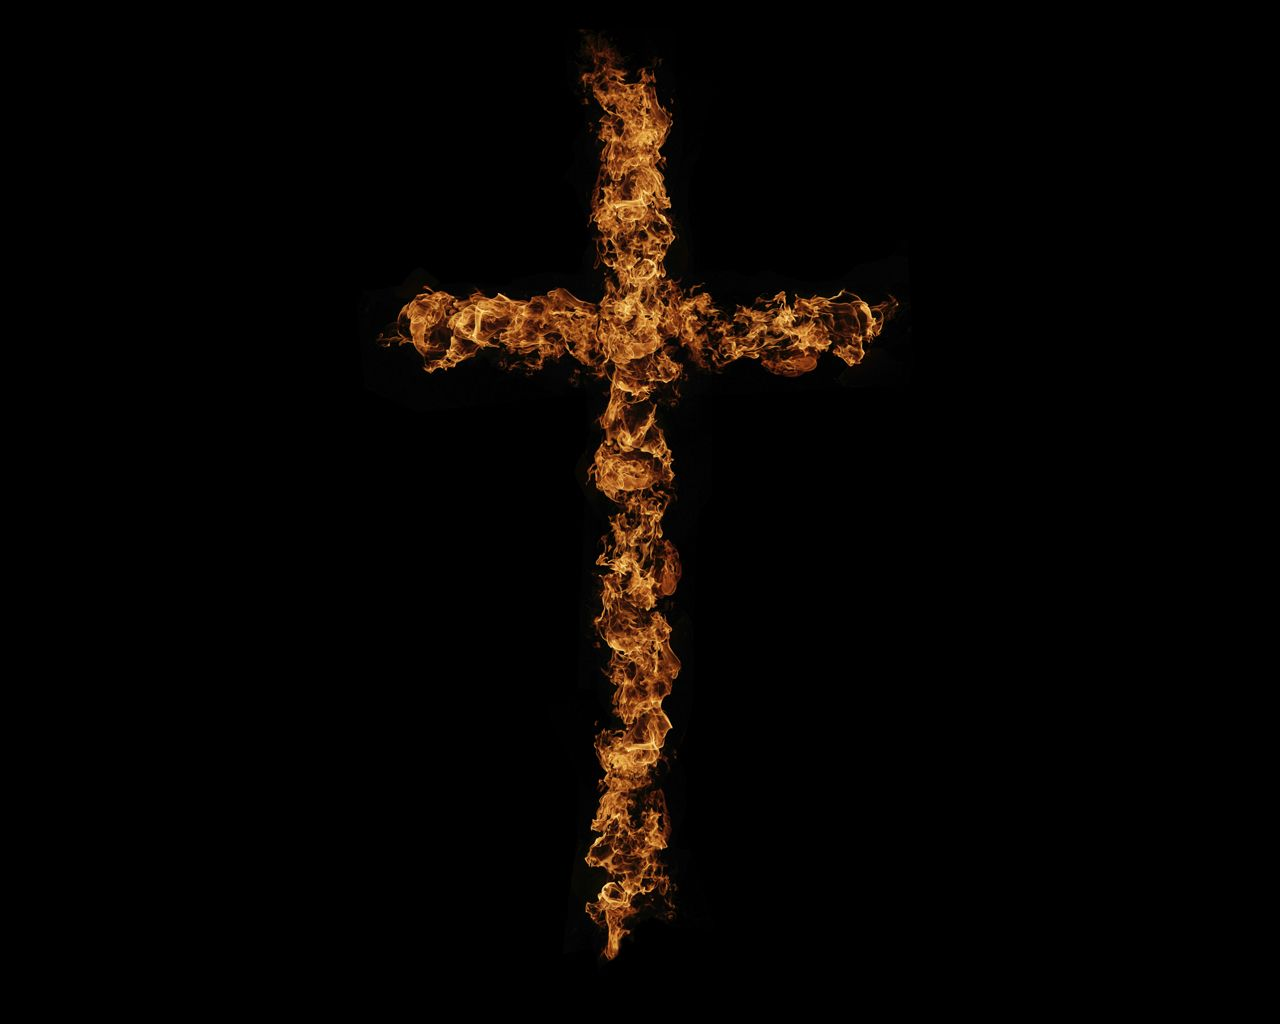 Christian Wallpapers Pinterest